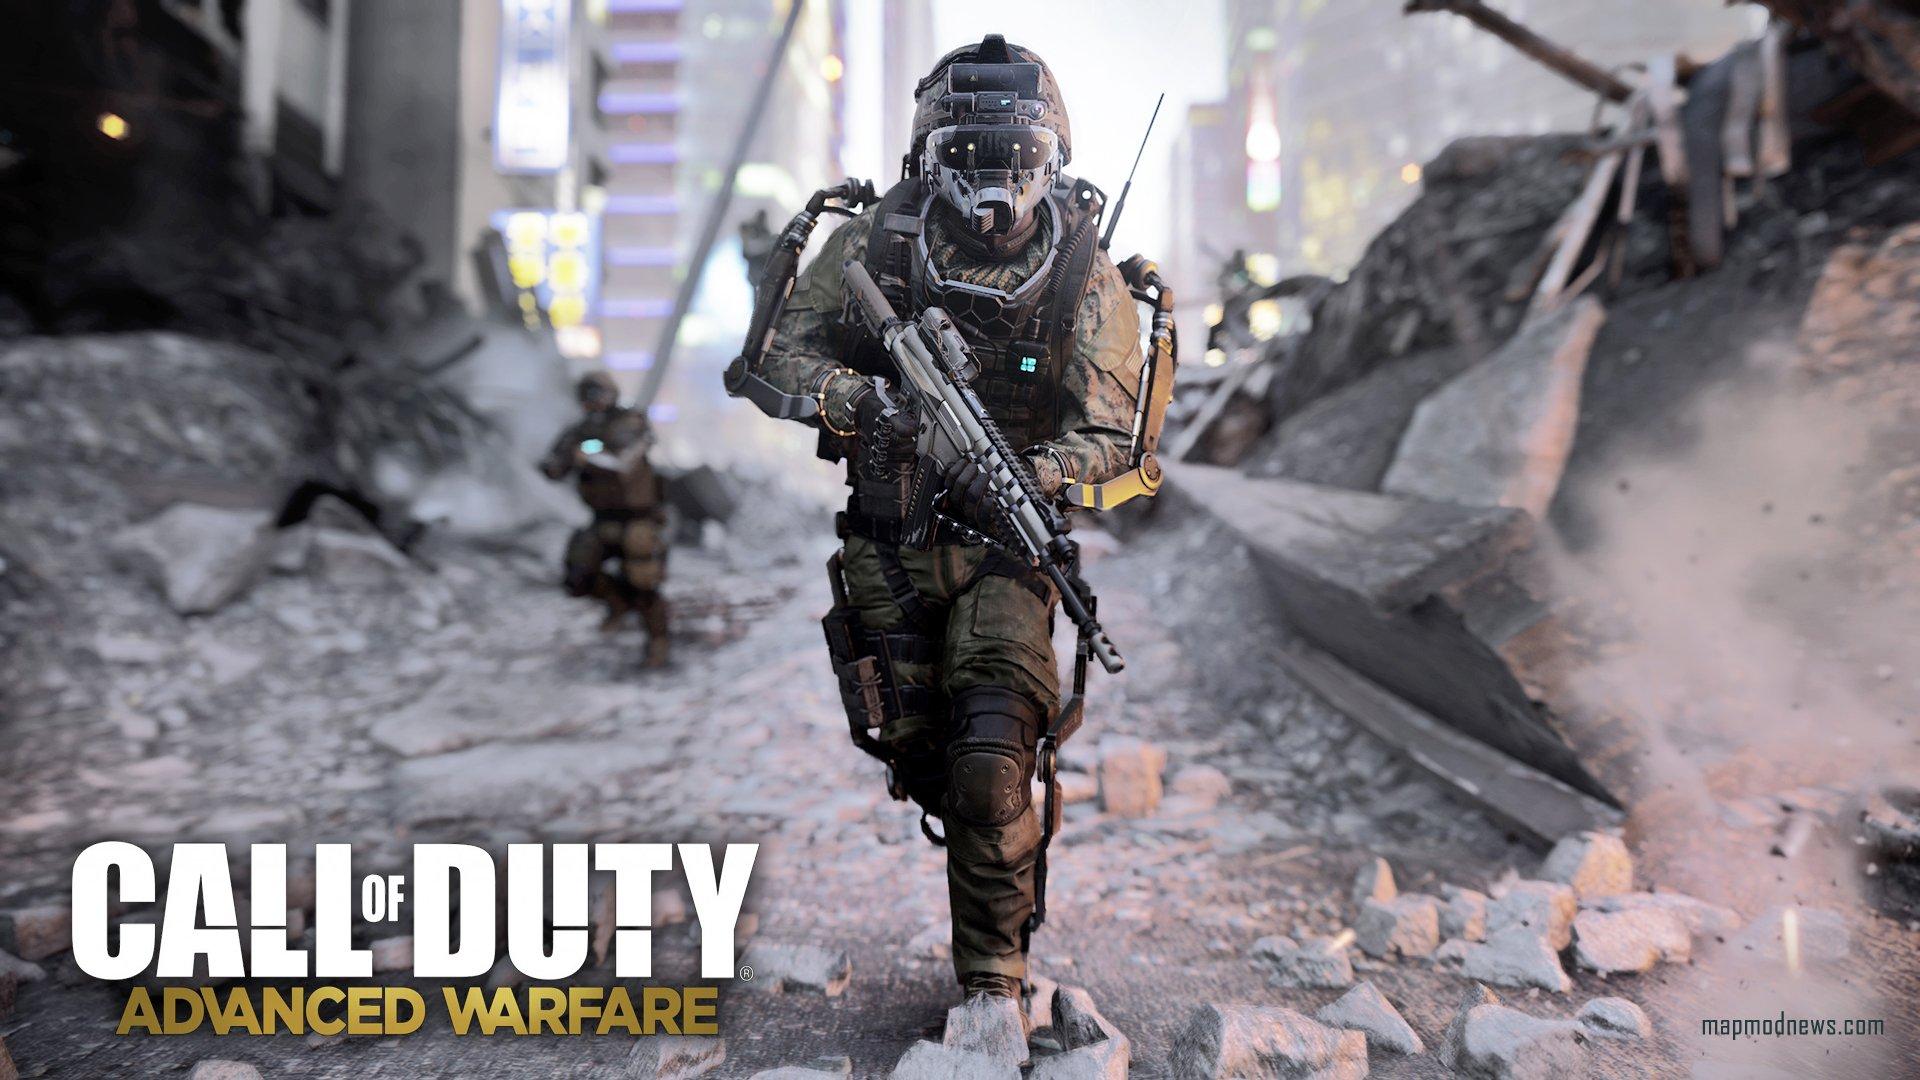 Call of Duty Advanced Warfare. Старая игра на новый лад. - Изображение 1